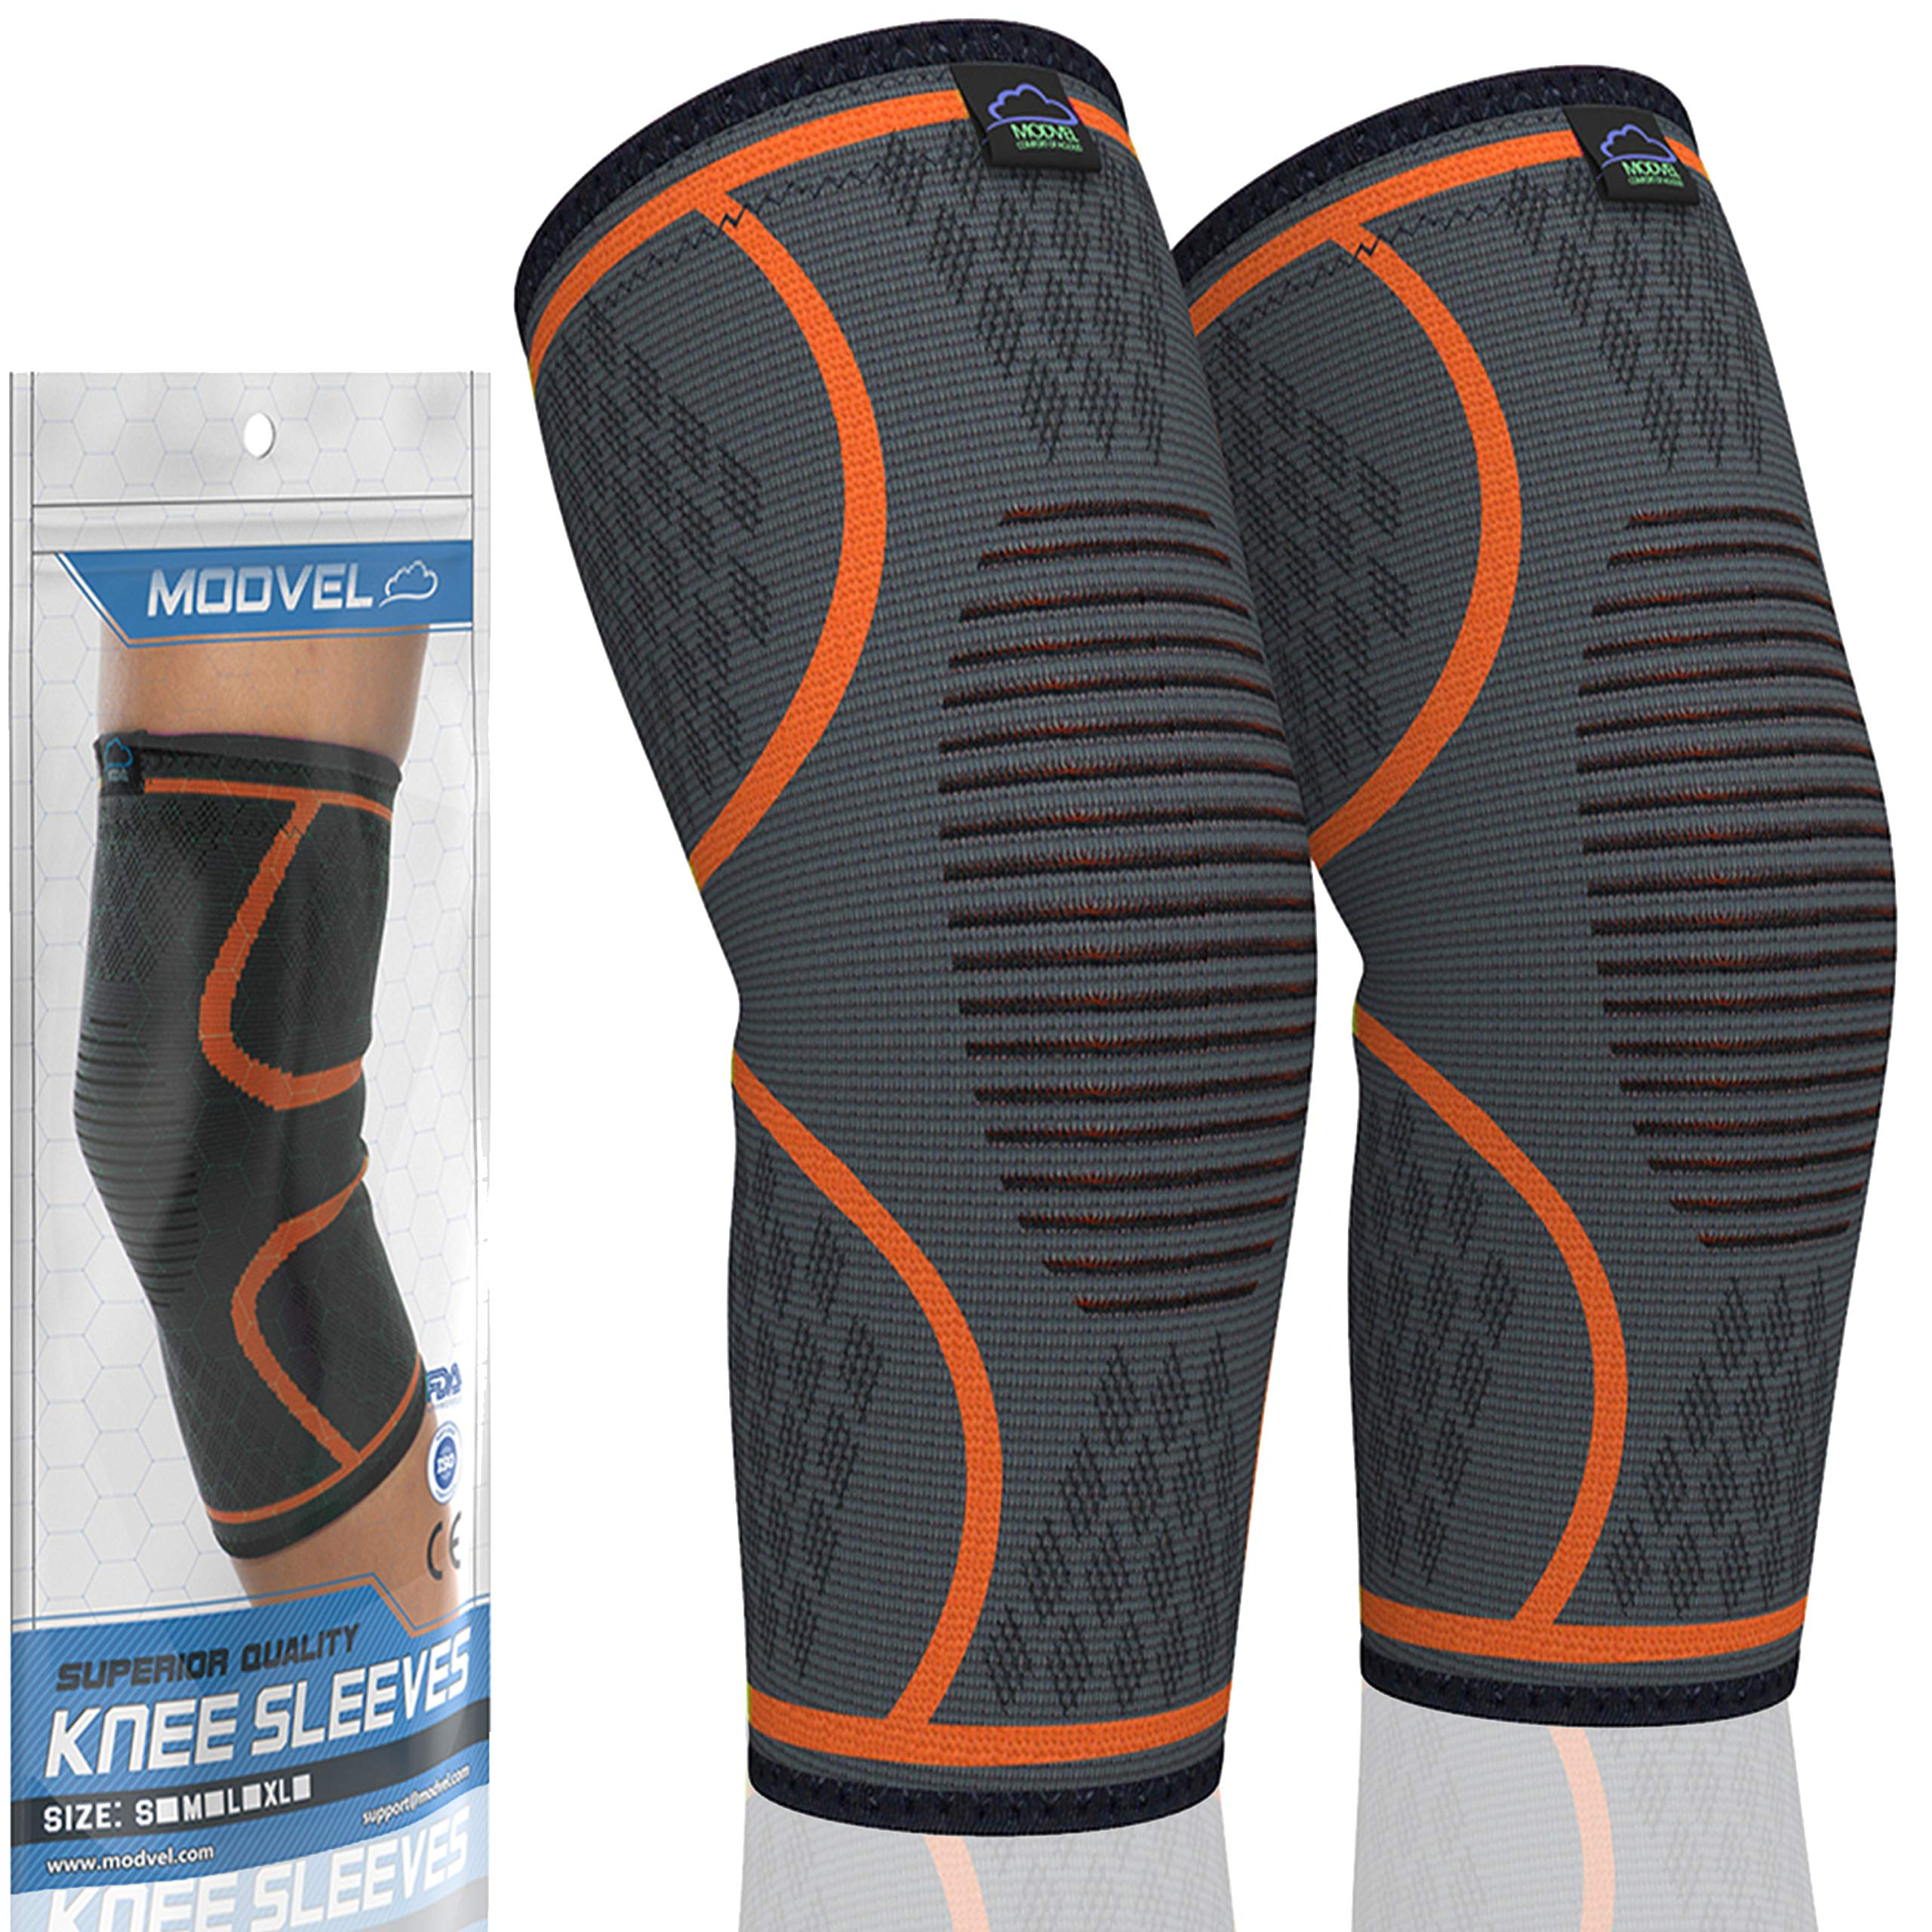 Modvel Compression Knee Sleeve Pair